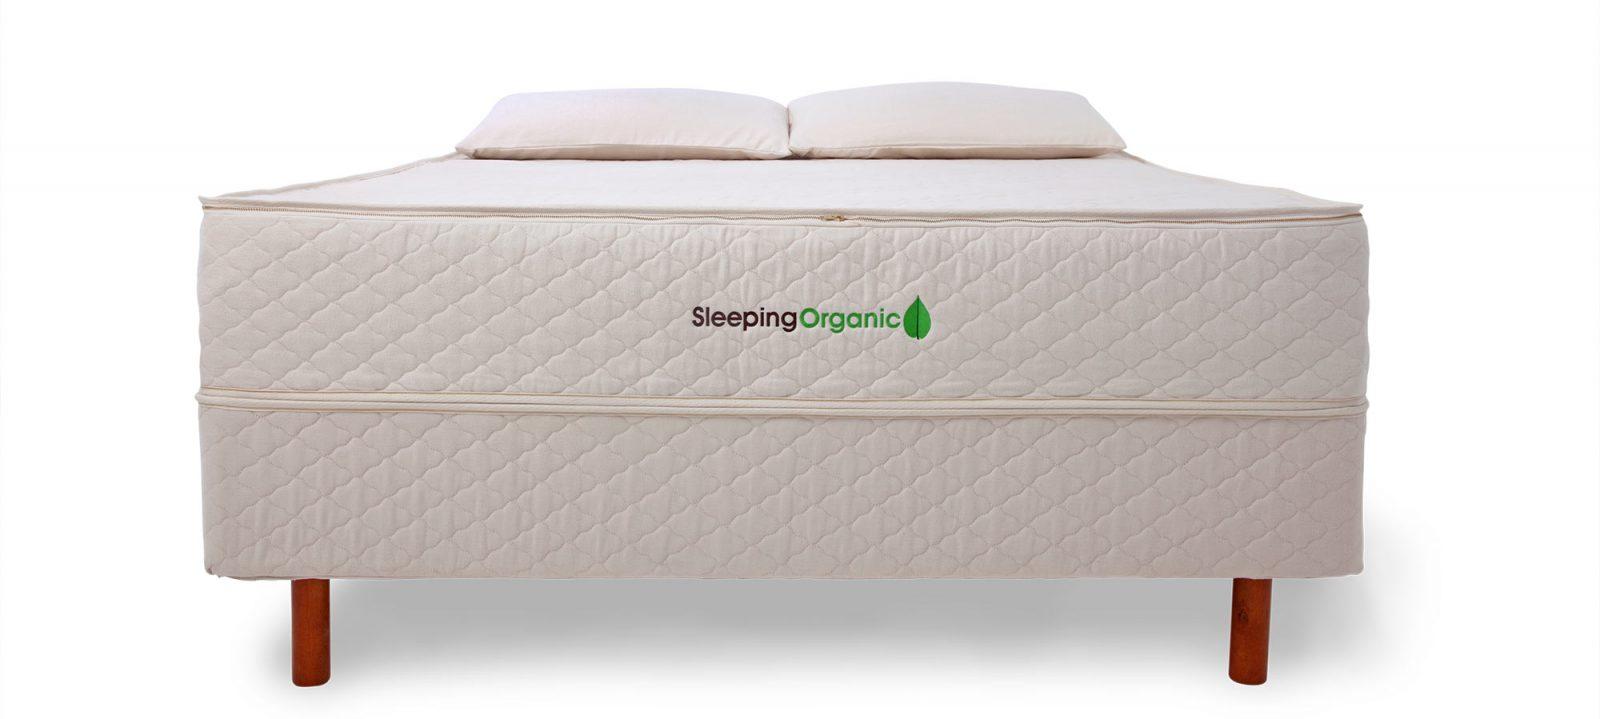 Sleeping Organic Natural Latex Mattresses & Bedding